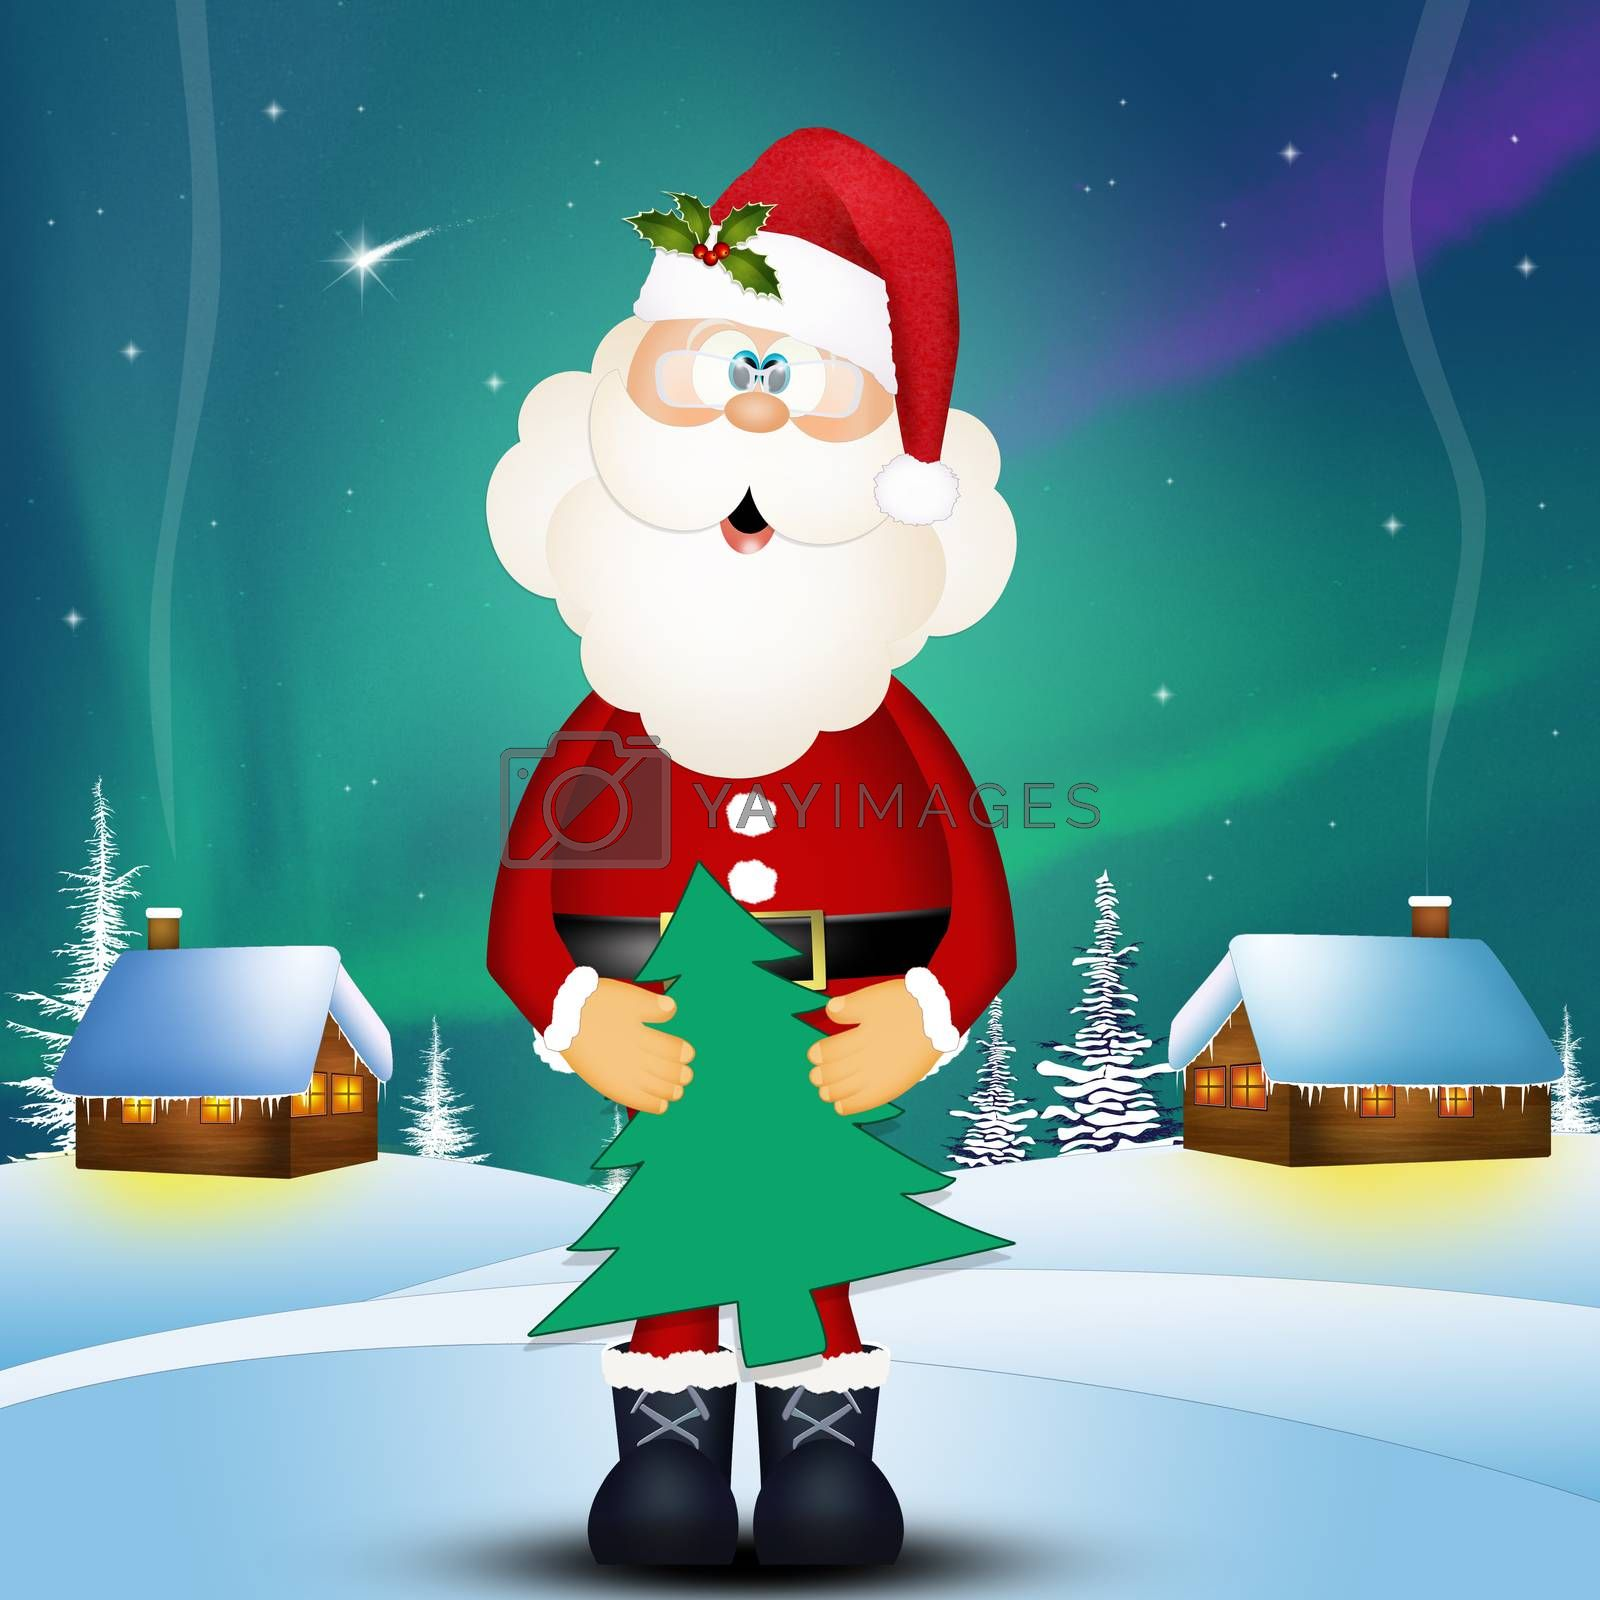 Santa Claus with Christmas tree decoration by adrenalina